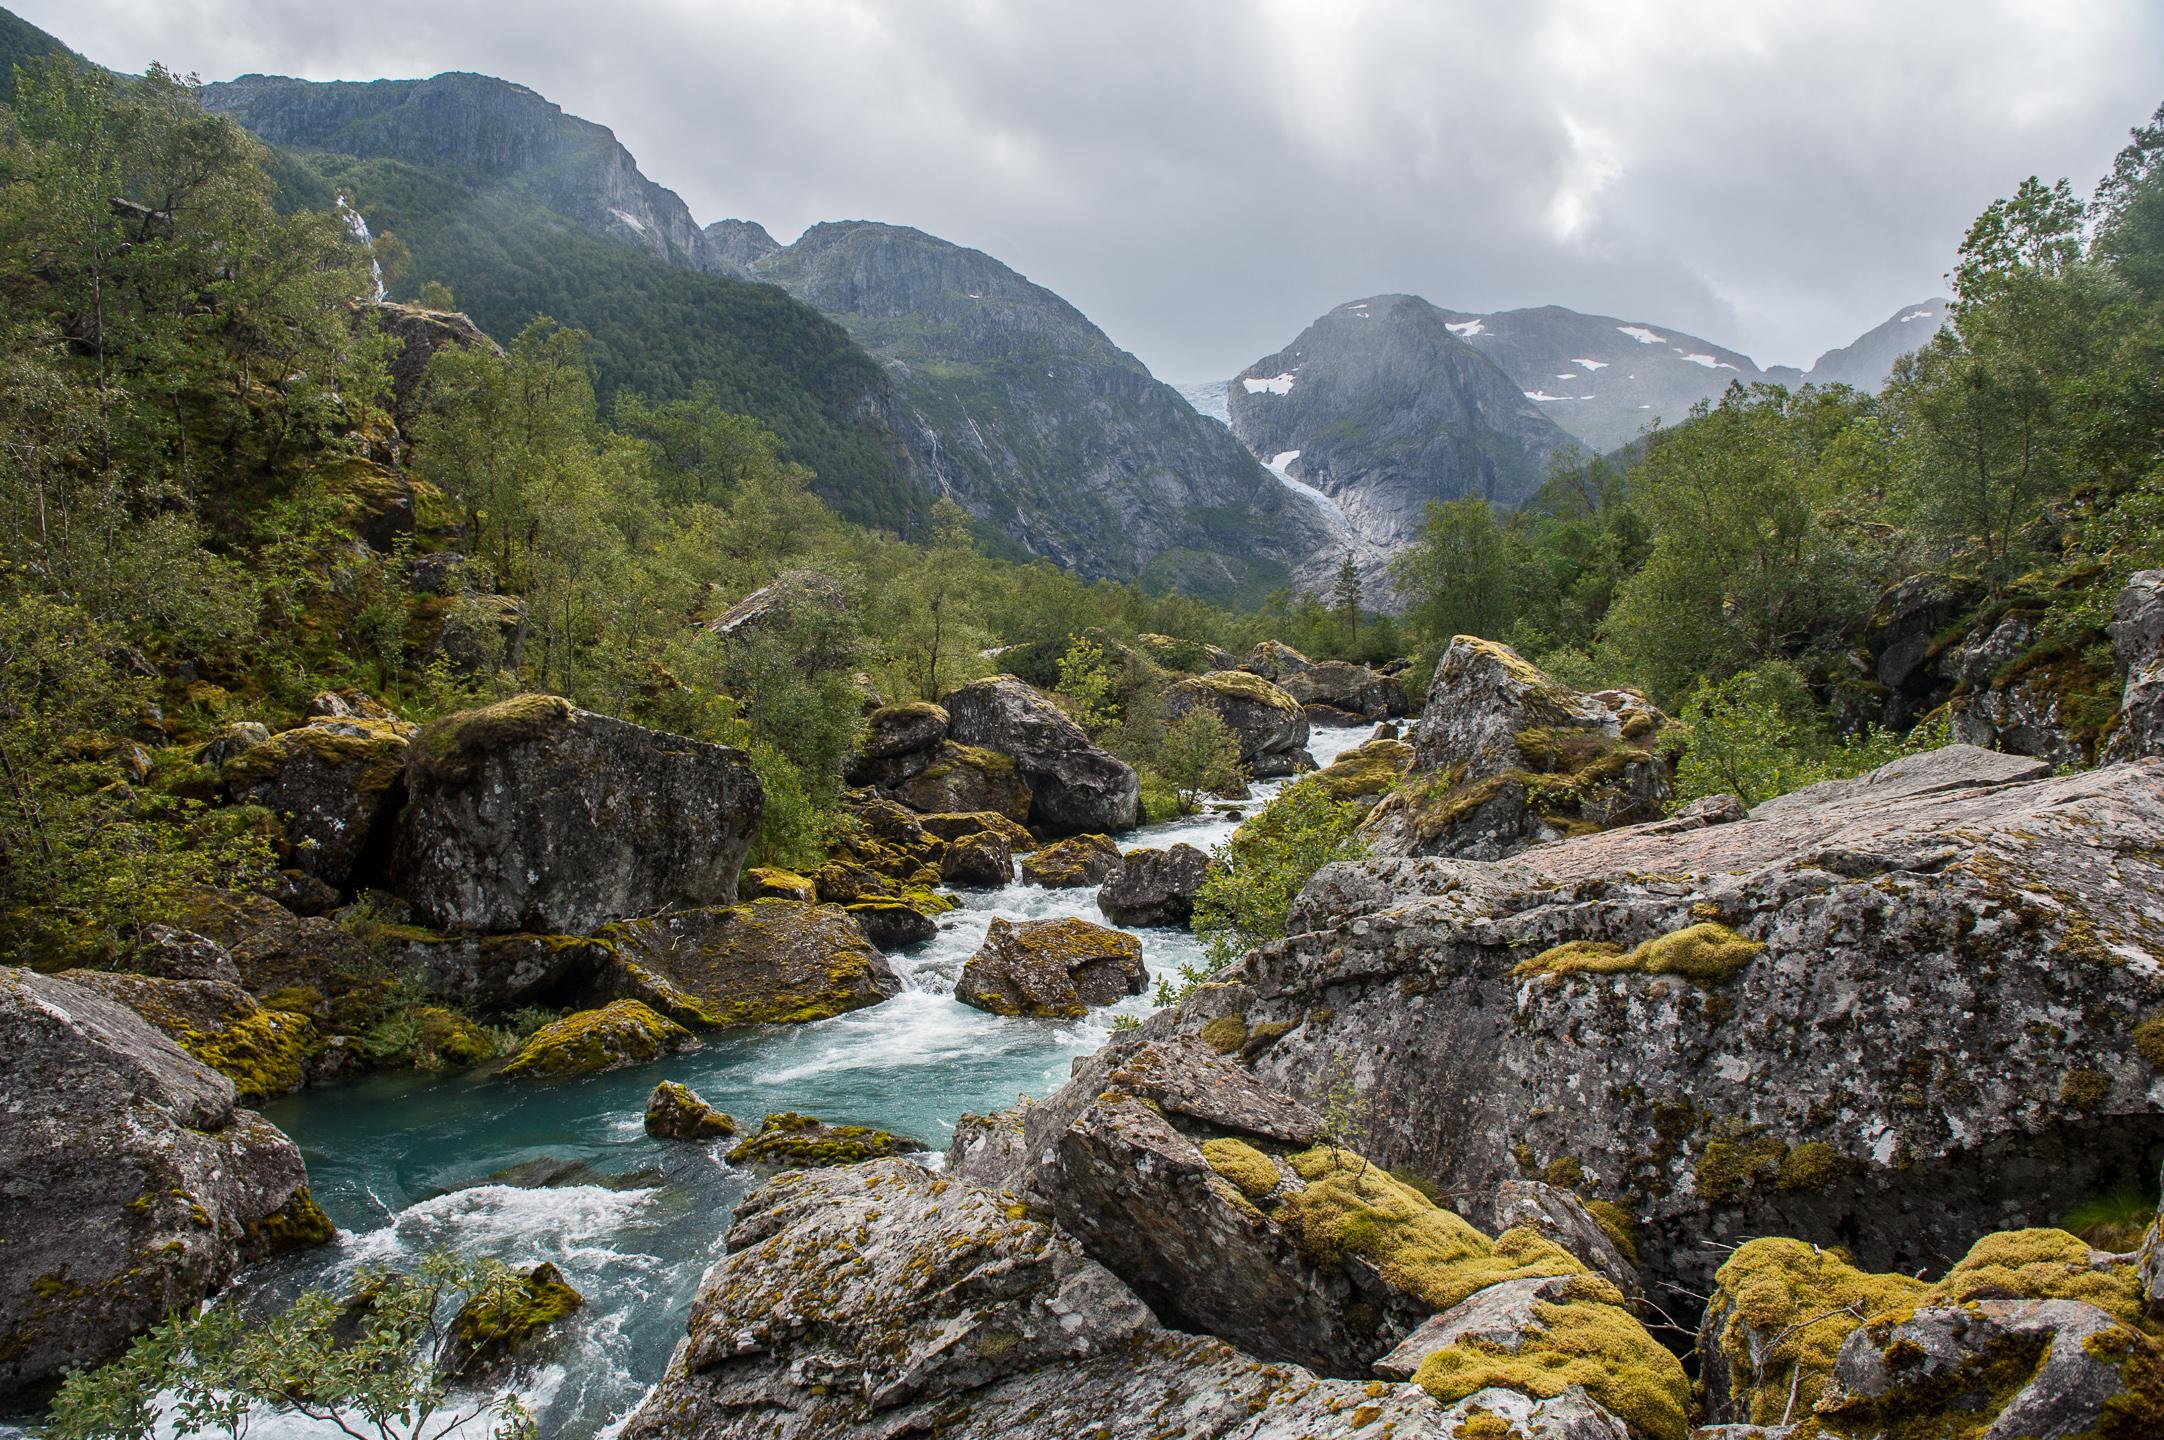 Skandinavien Roadtrip – Geiranger, Trollstigen, Bondhusdalen, Skagen